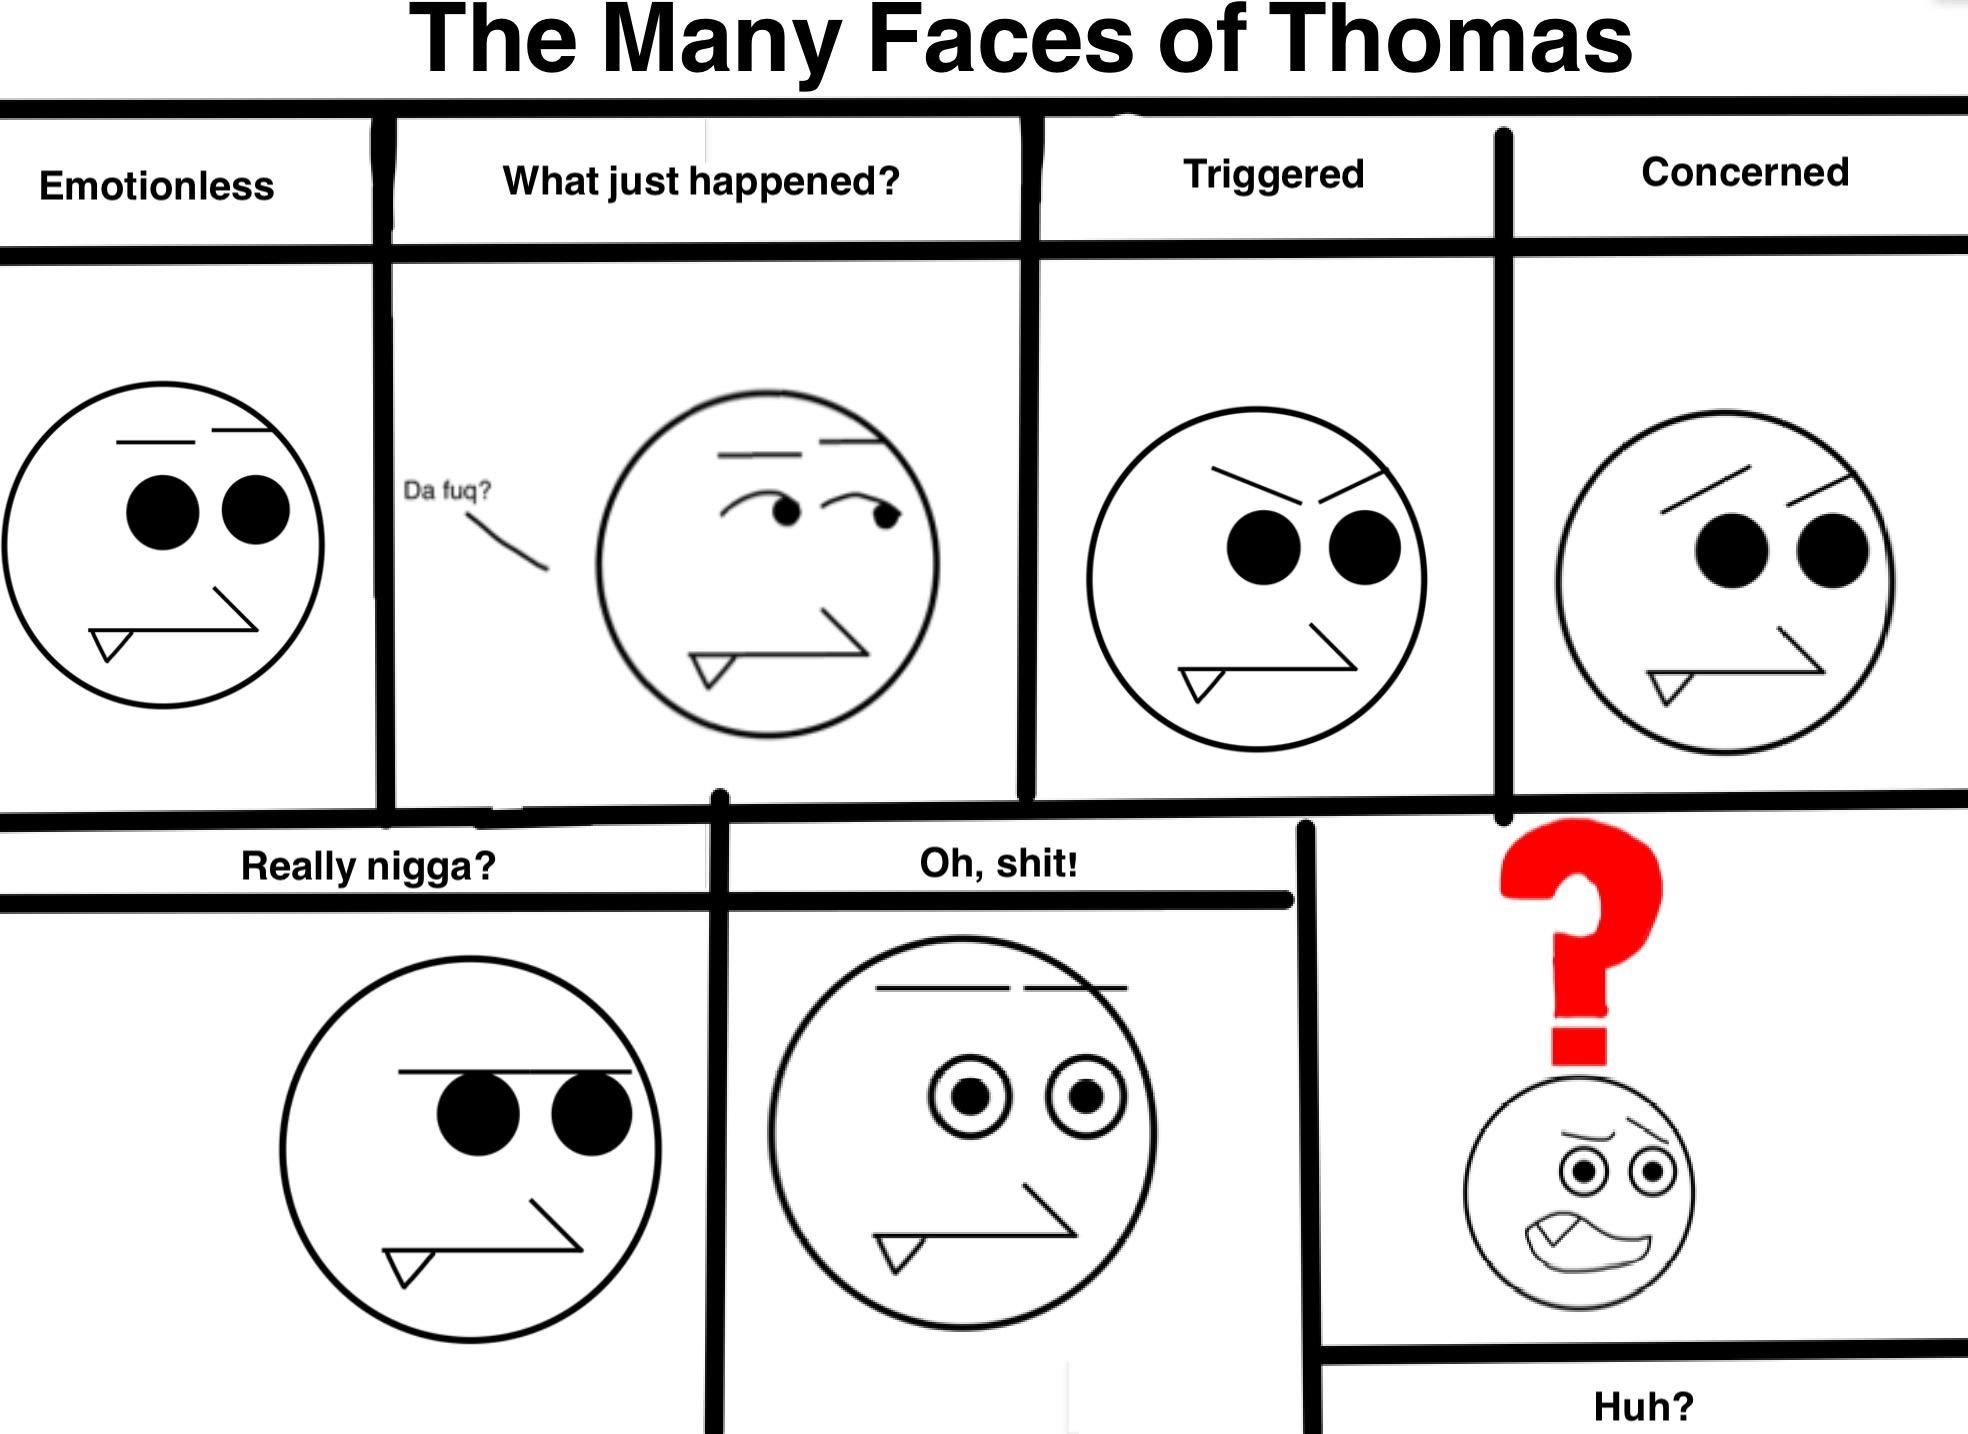 The Many Faces of Thomas